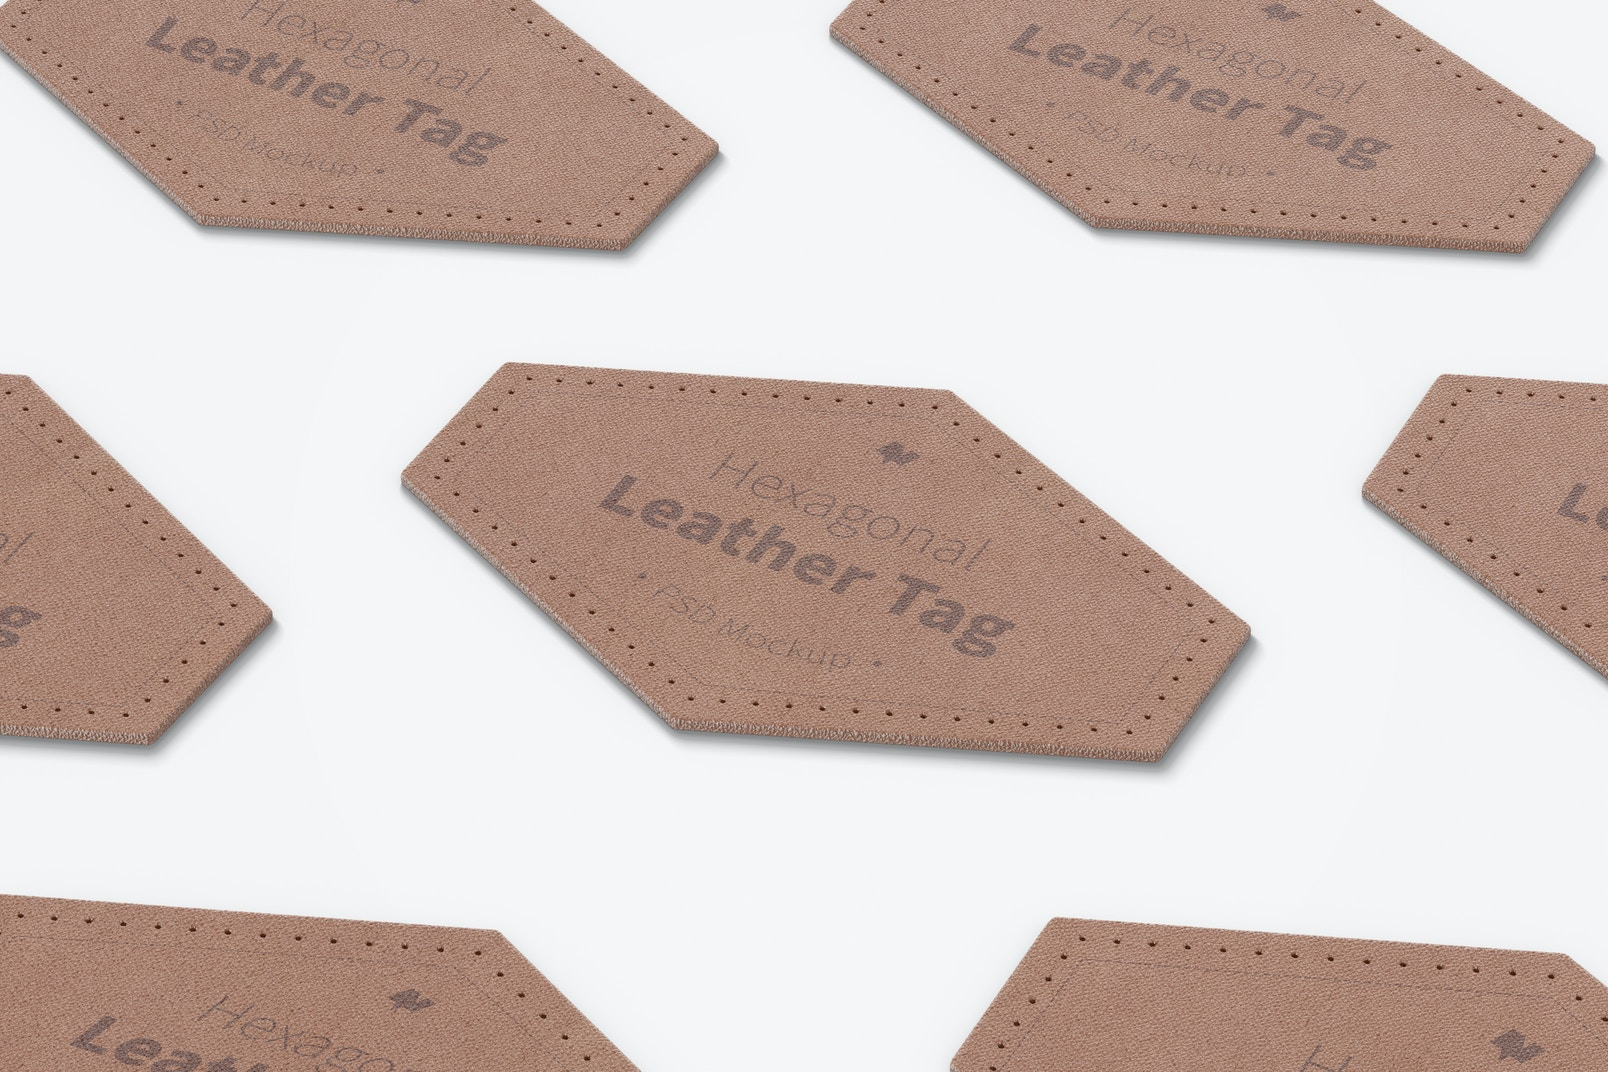 Hexagonal Leather Tags Mockup, Mosaic